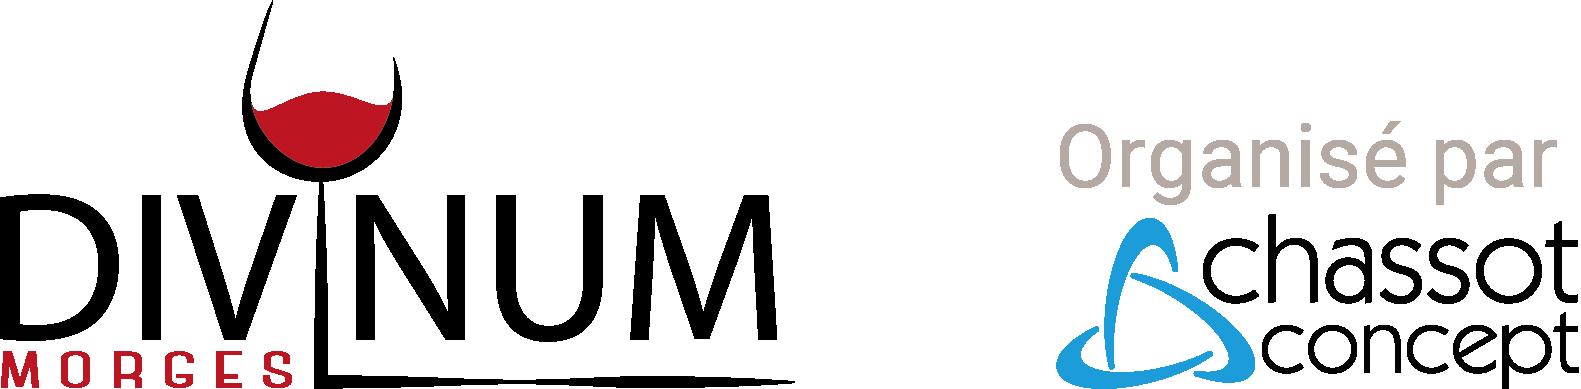 logo_divinum+chassot-2-01